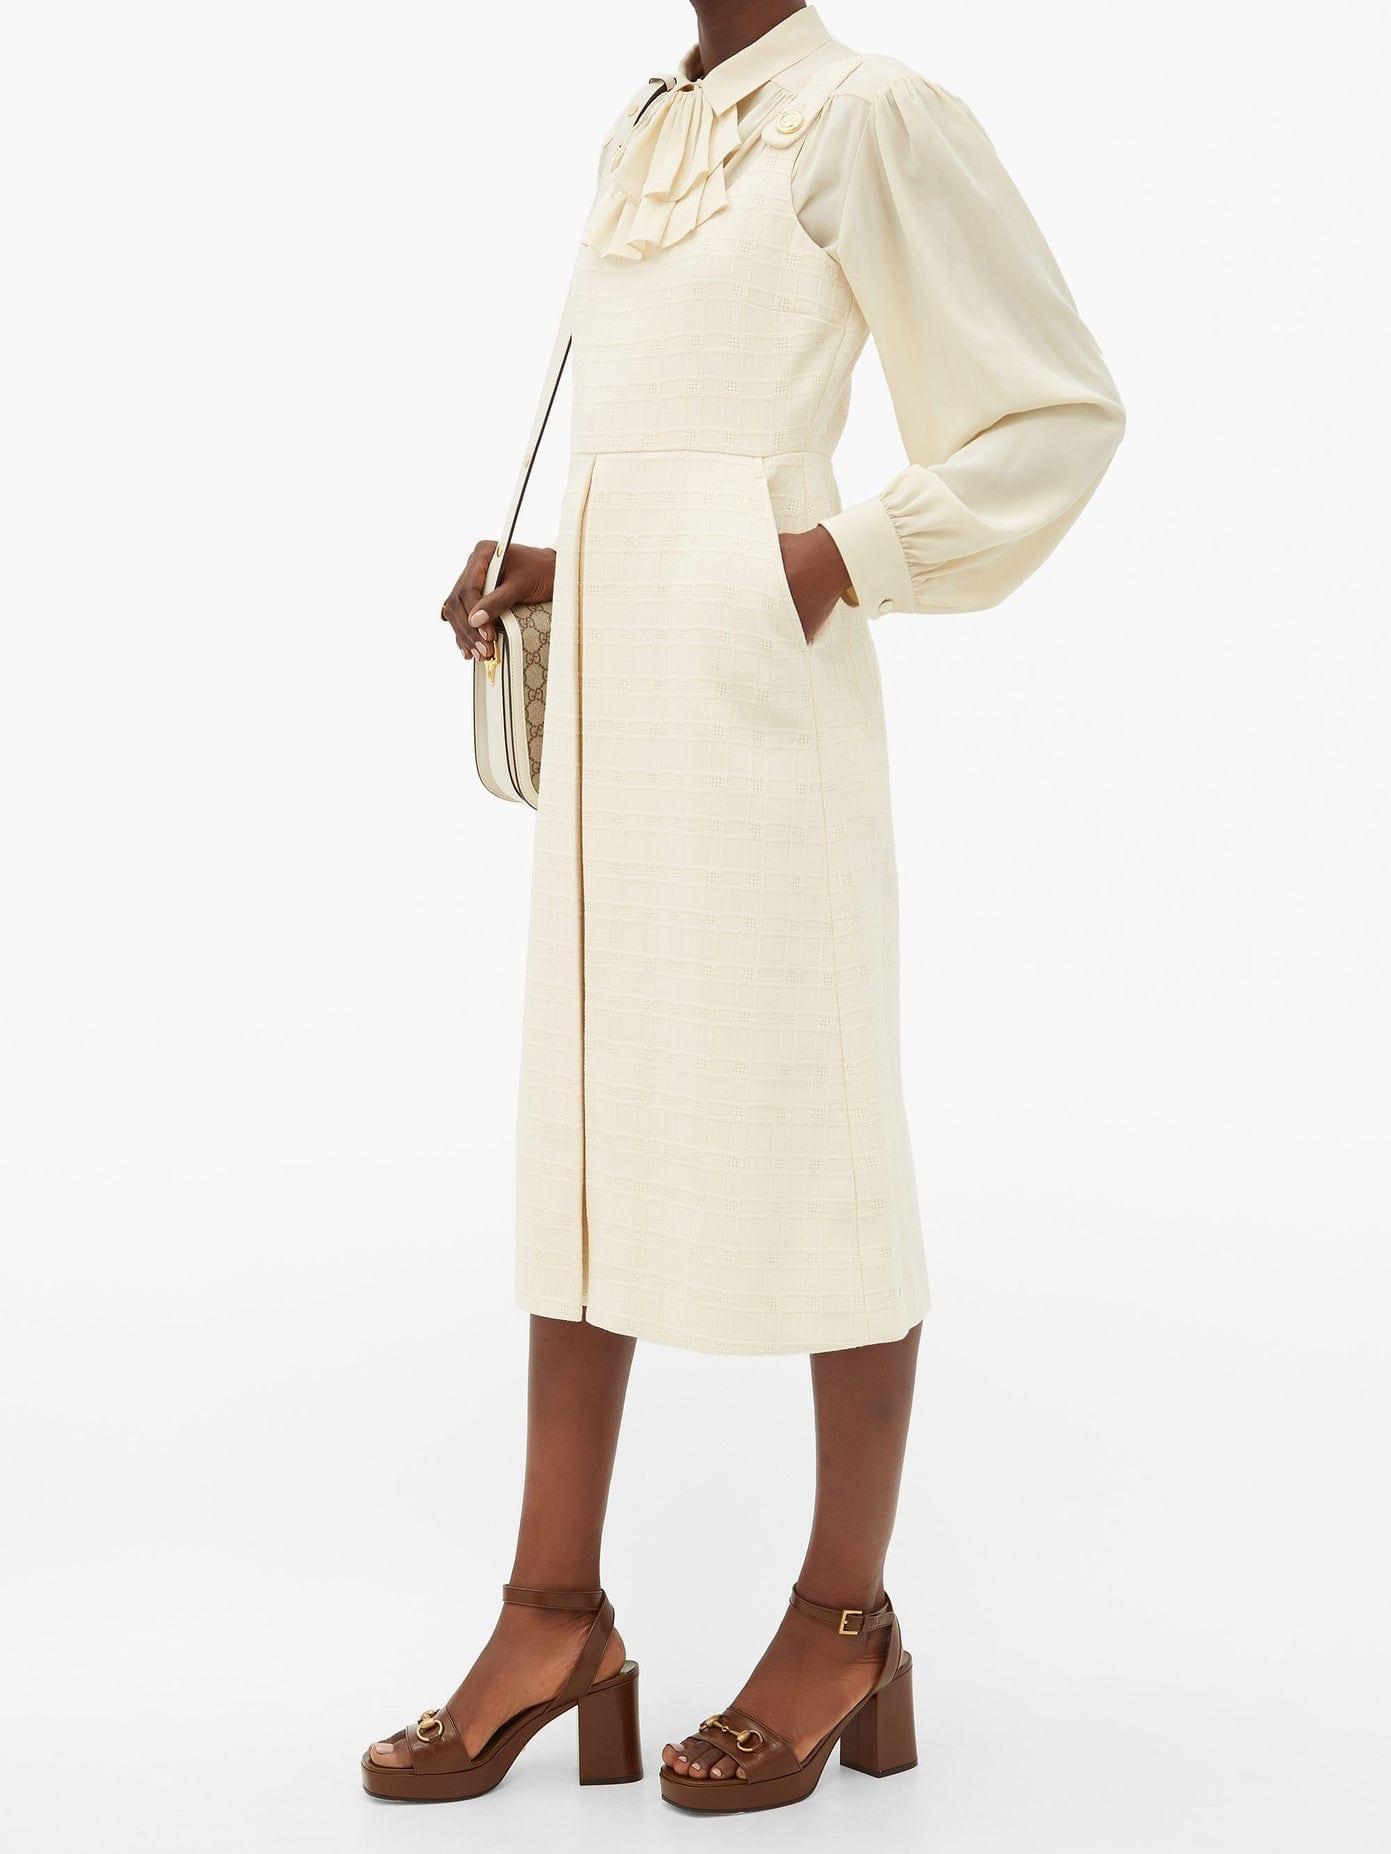 GUCCI Checked Cotton-blend Jacquard Dress